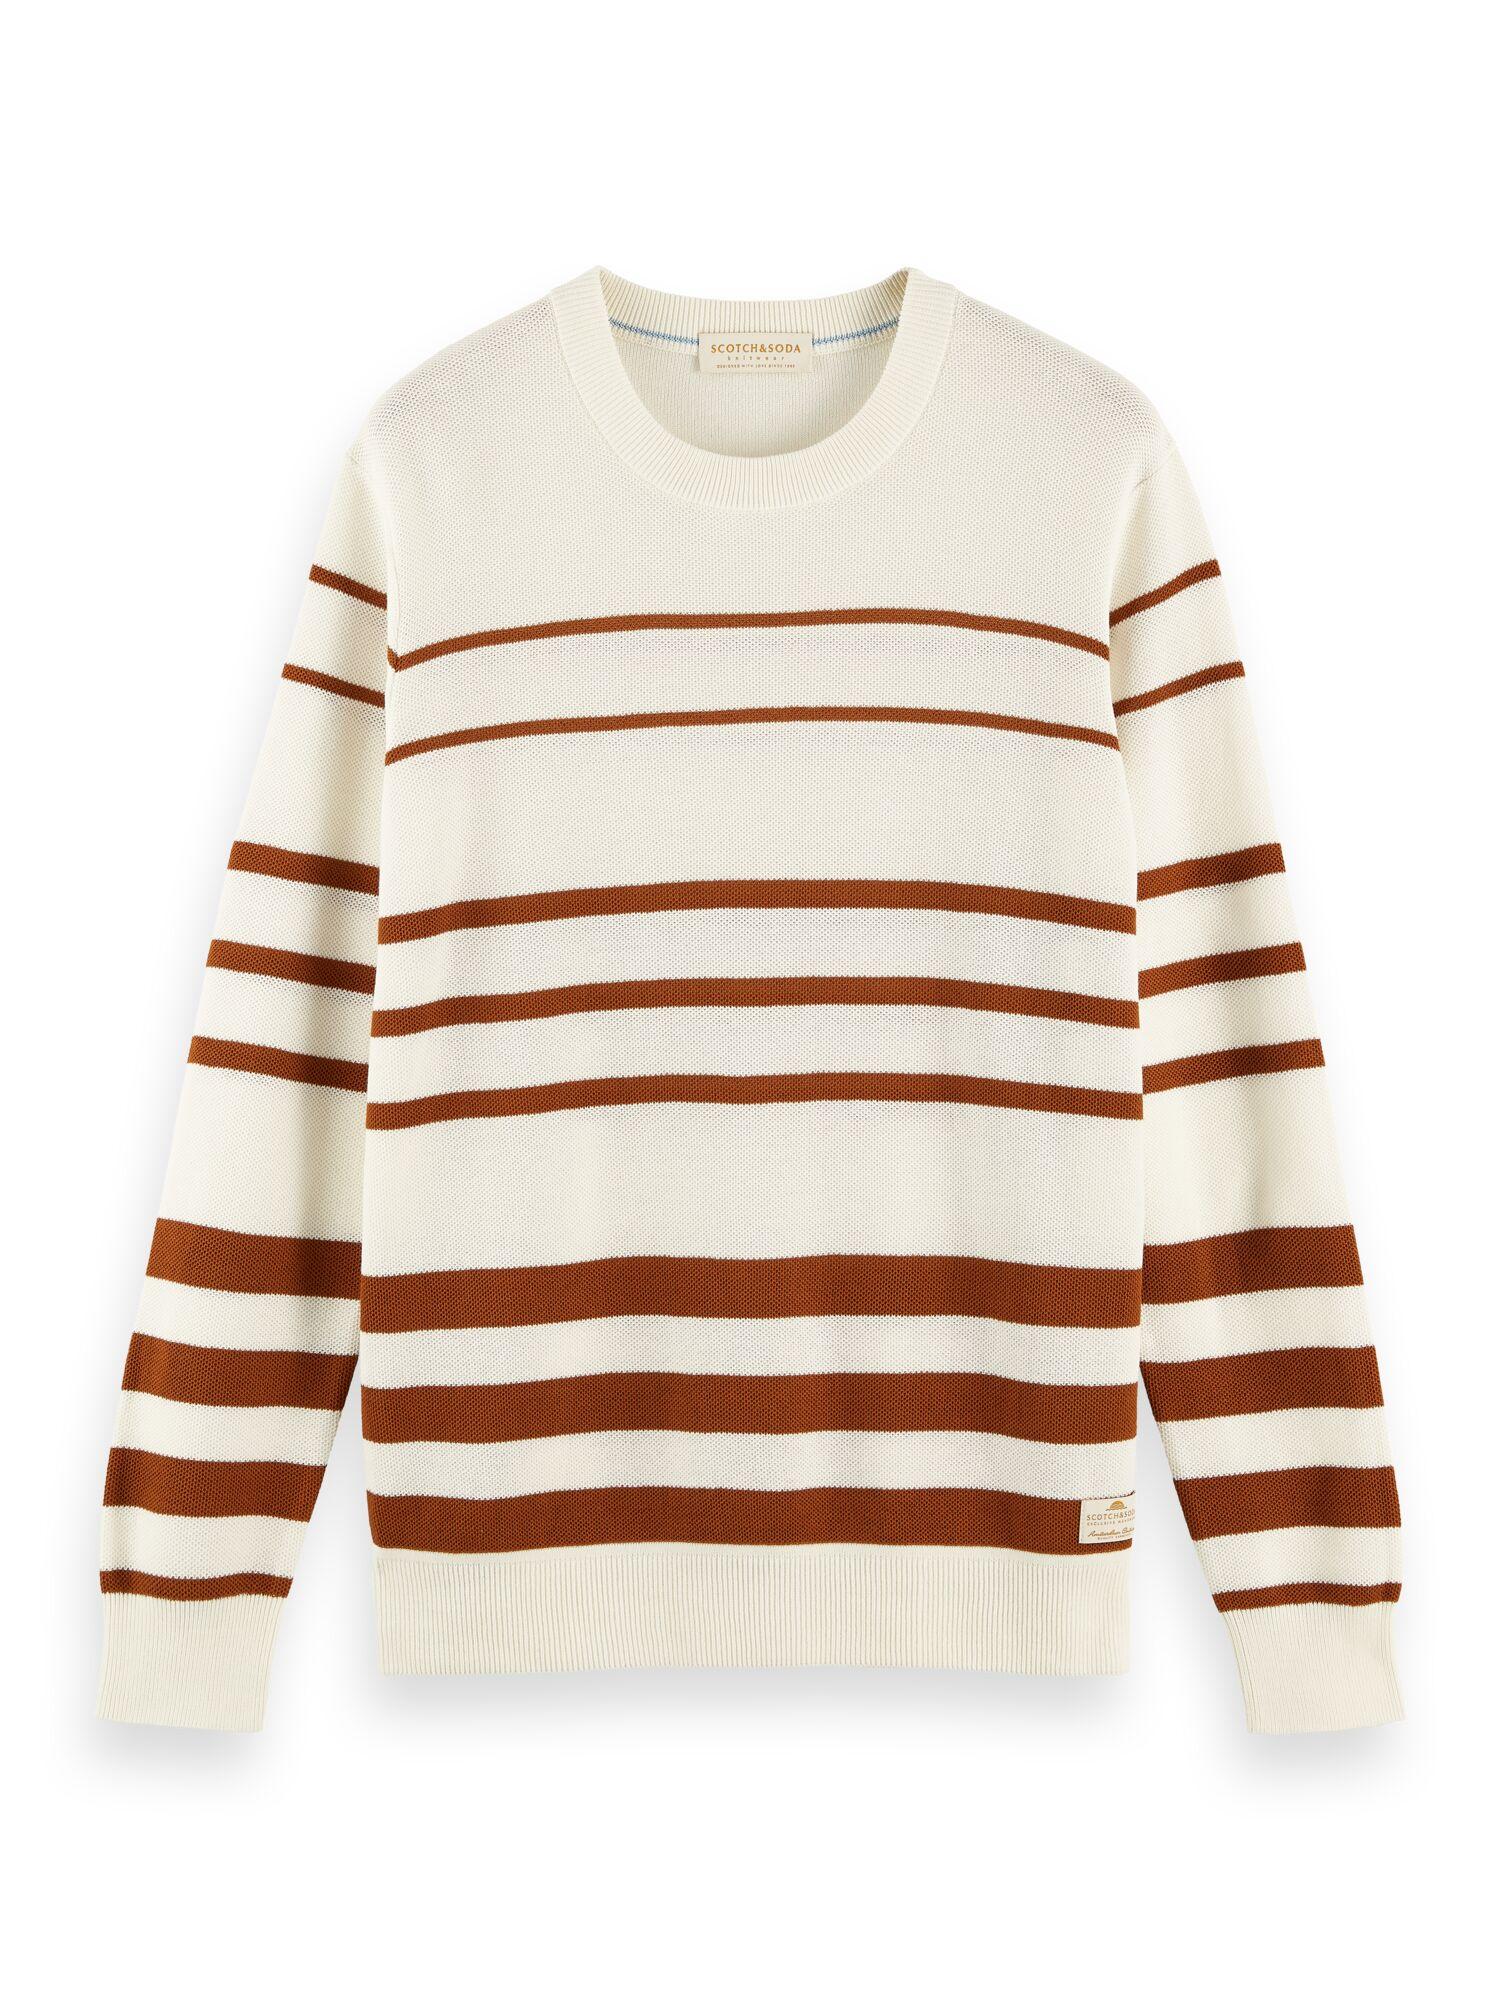 Scotch & Soda | Organic cotton crewneck pull in structured knit